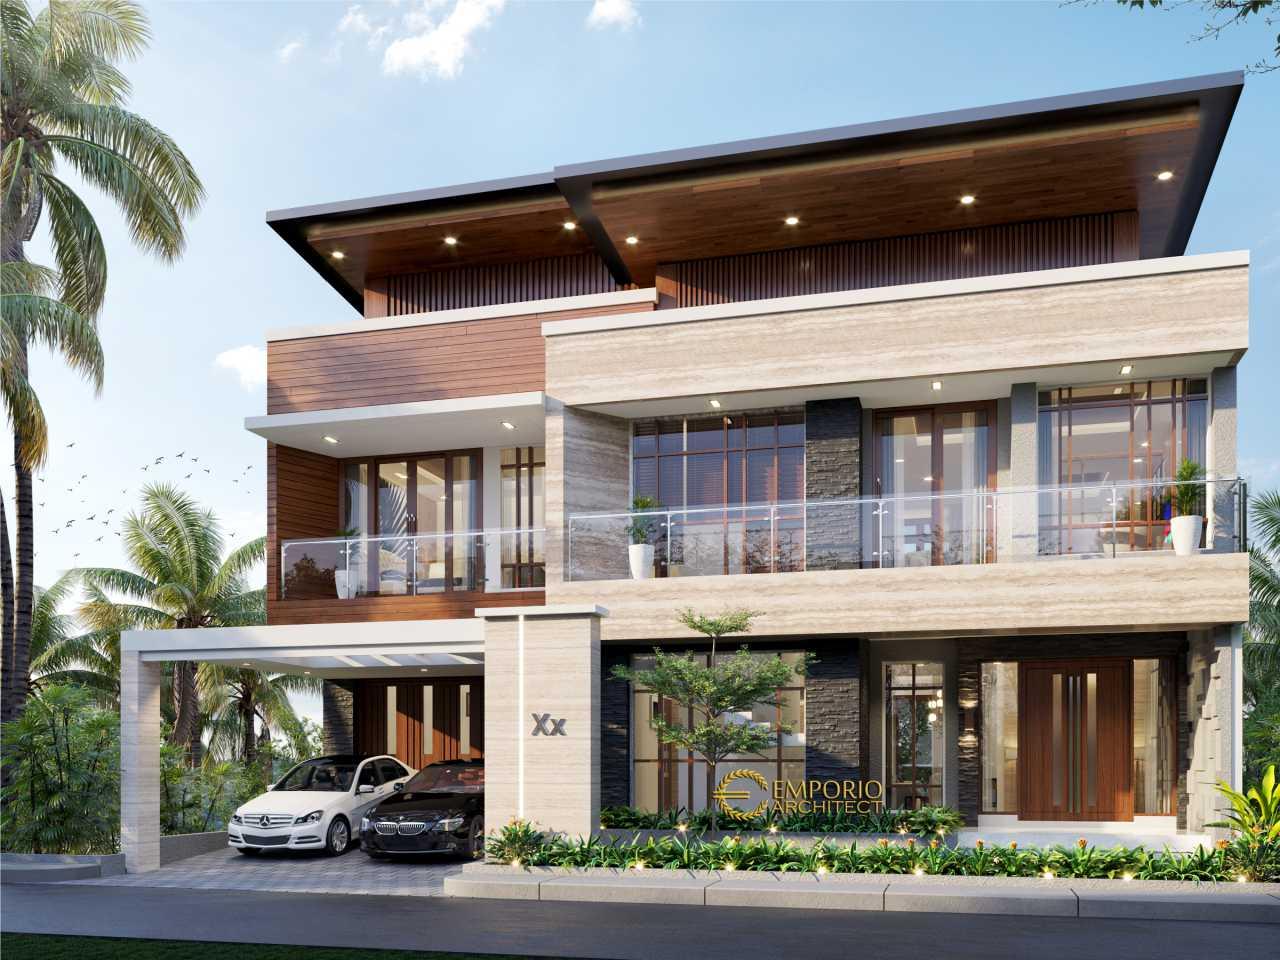 Desain Rumah Modern 3 Lantai Ibu Pauline Di Bandung Jawa Barat